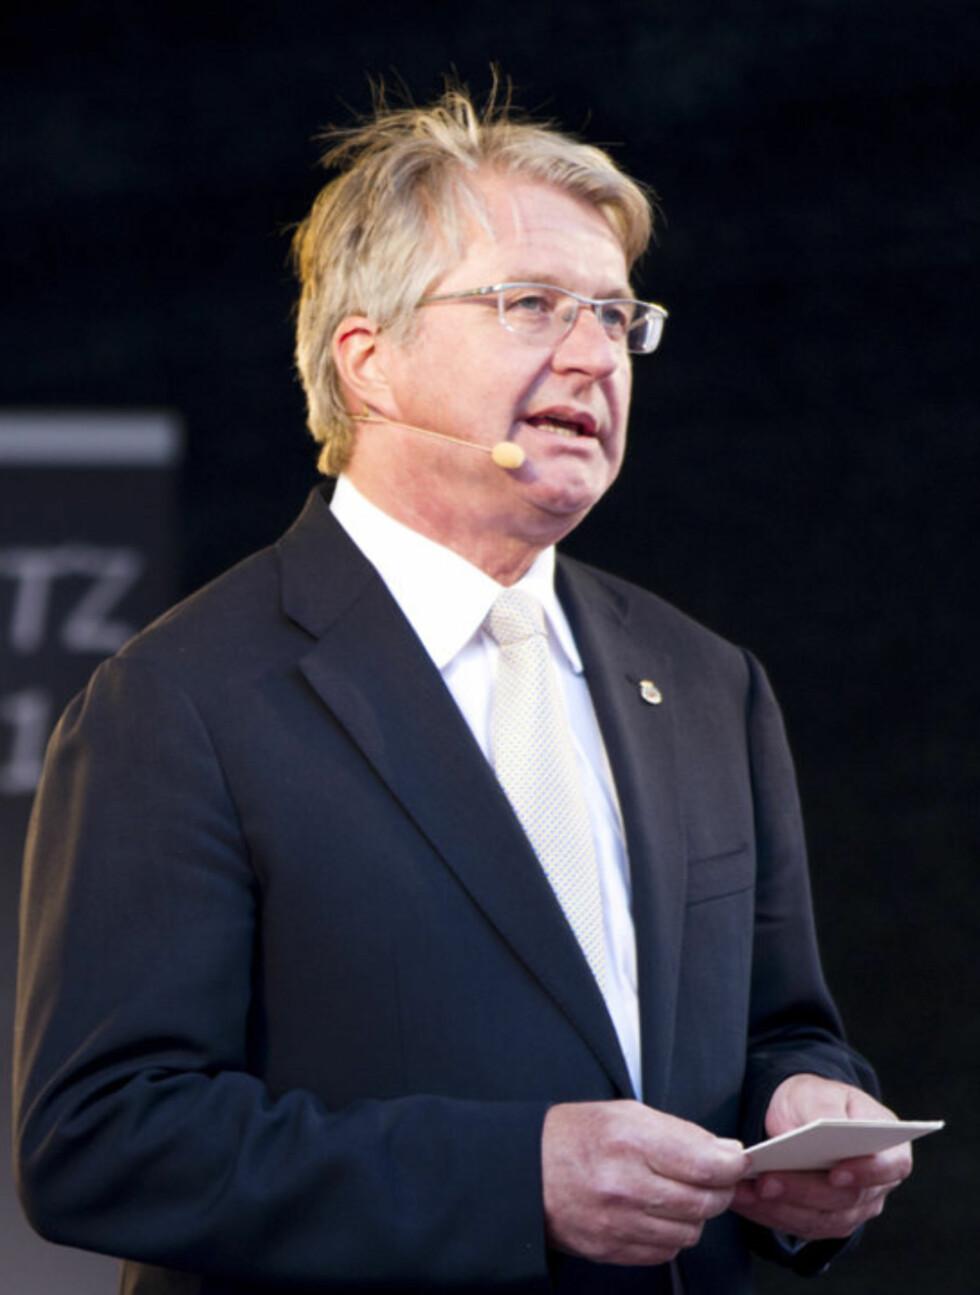 HYLLEST: Oslo-ordfører Fabian Stang var blant de mange som holdt tale over Grete Waitz under minnemarkeringen på Bislett stadion.  Foto: Scanpix